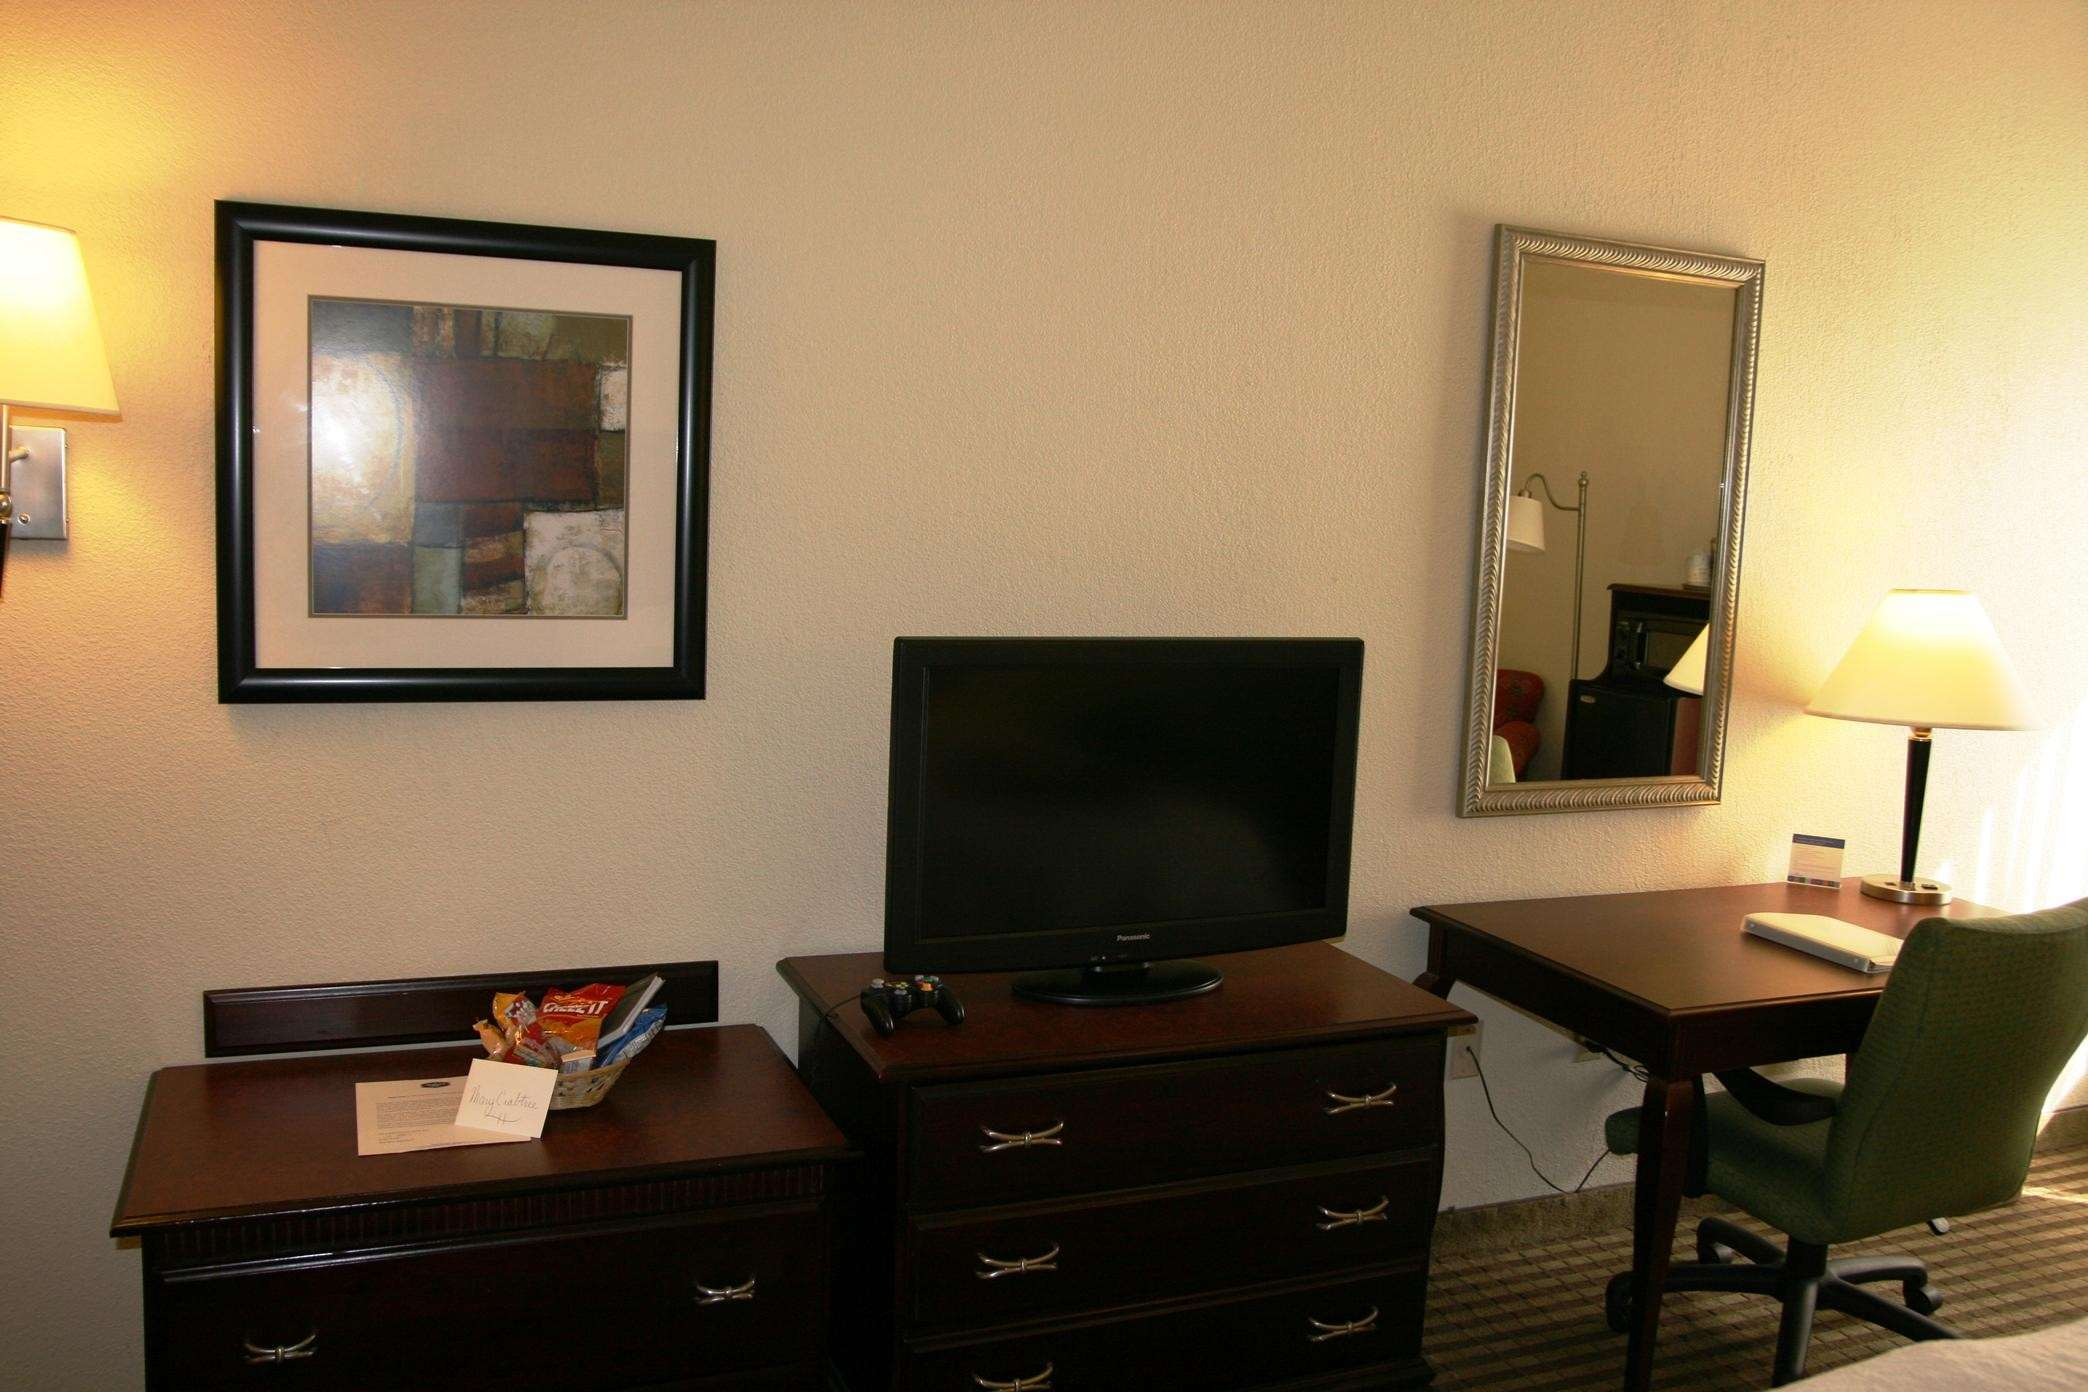 32-inch Flat-Screen TV